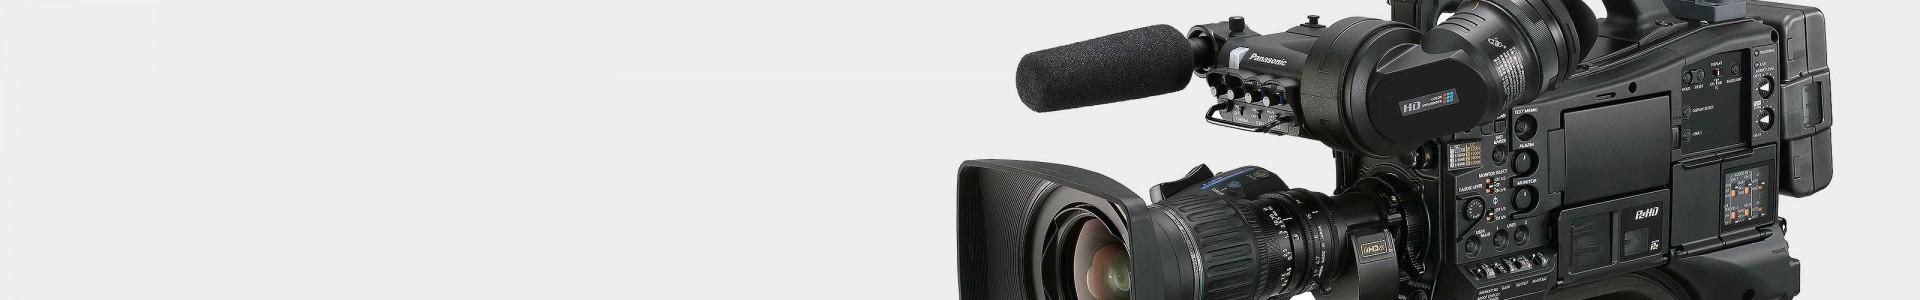 Panasonic - Cámaras de vídeo  profesionales - Avacab